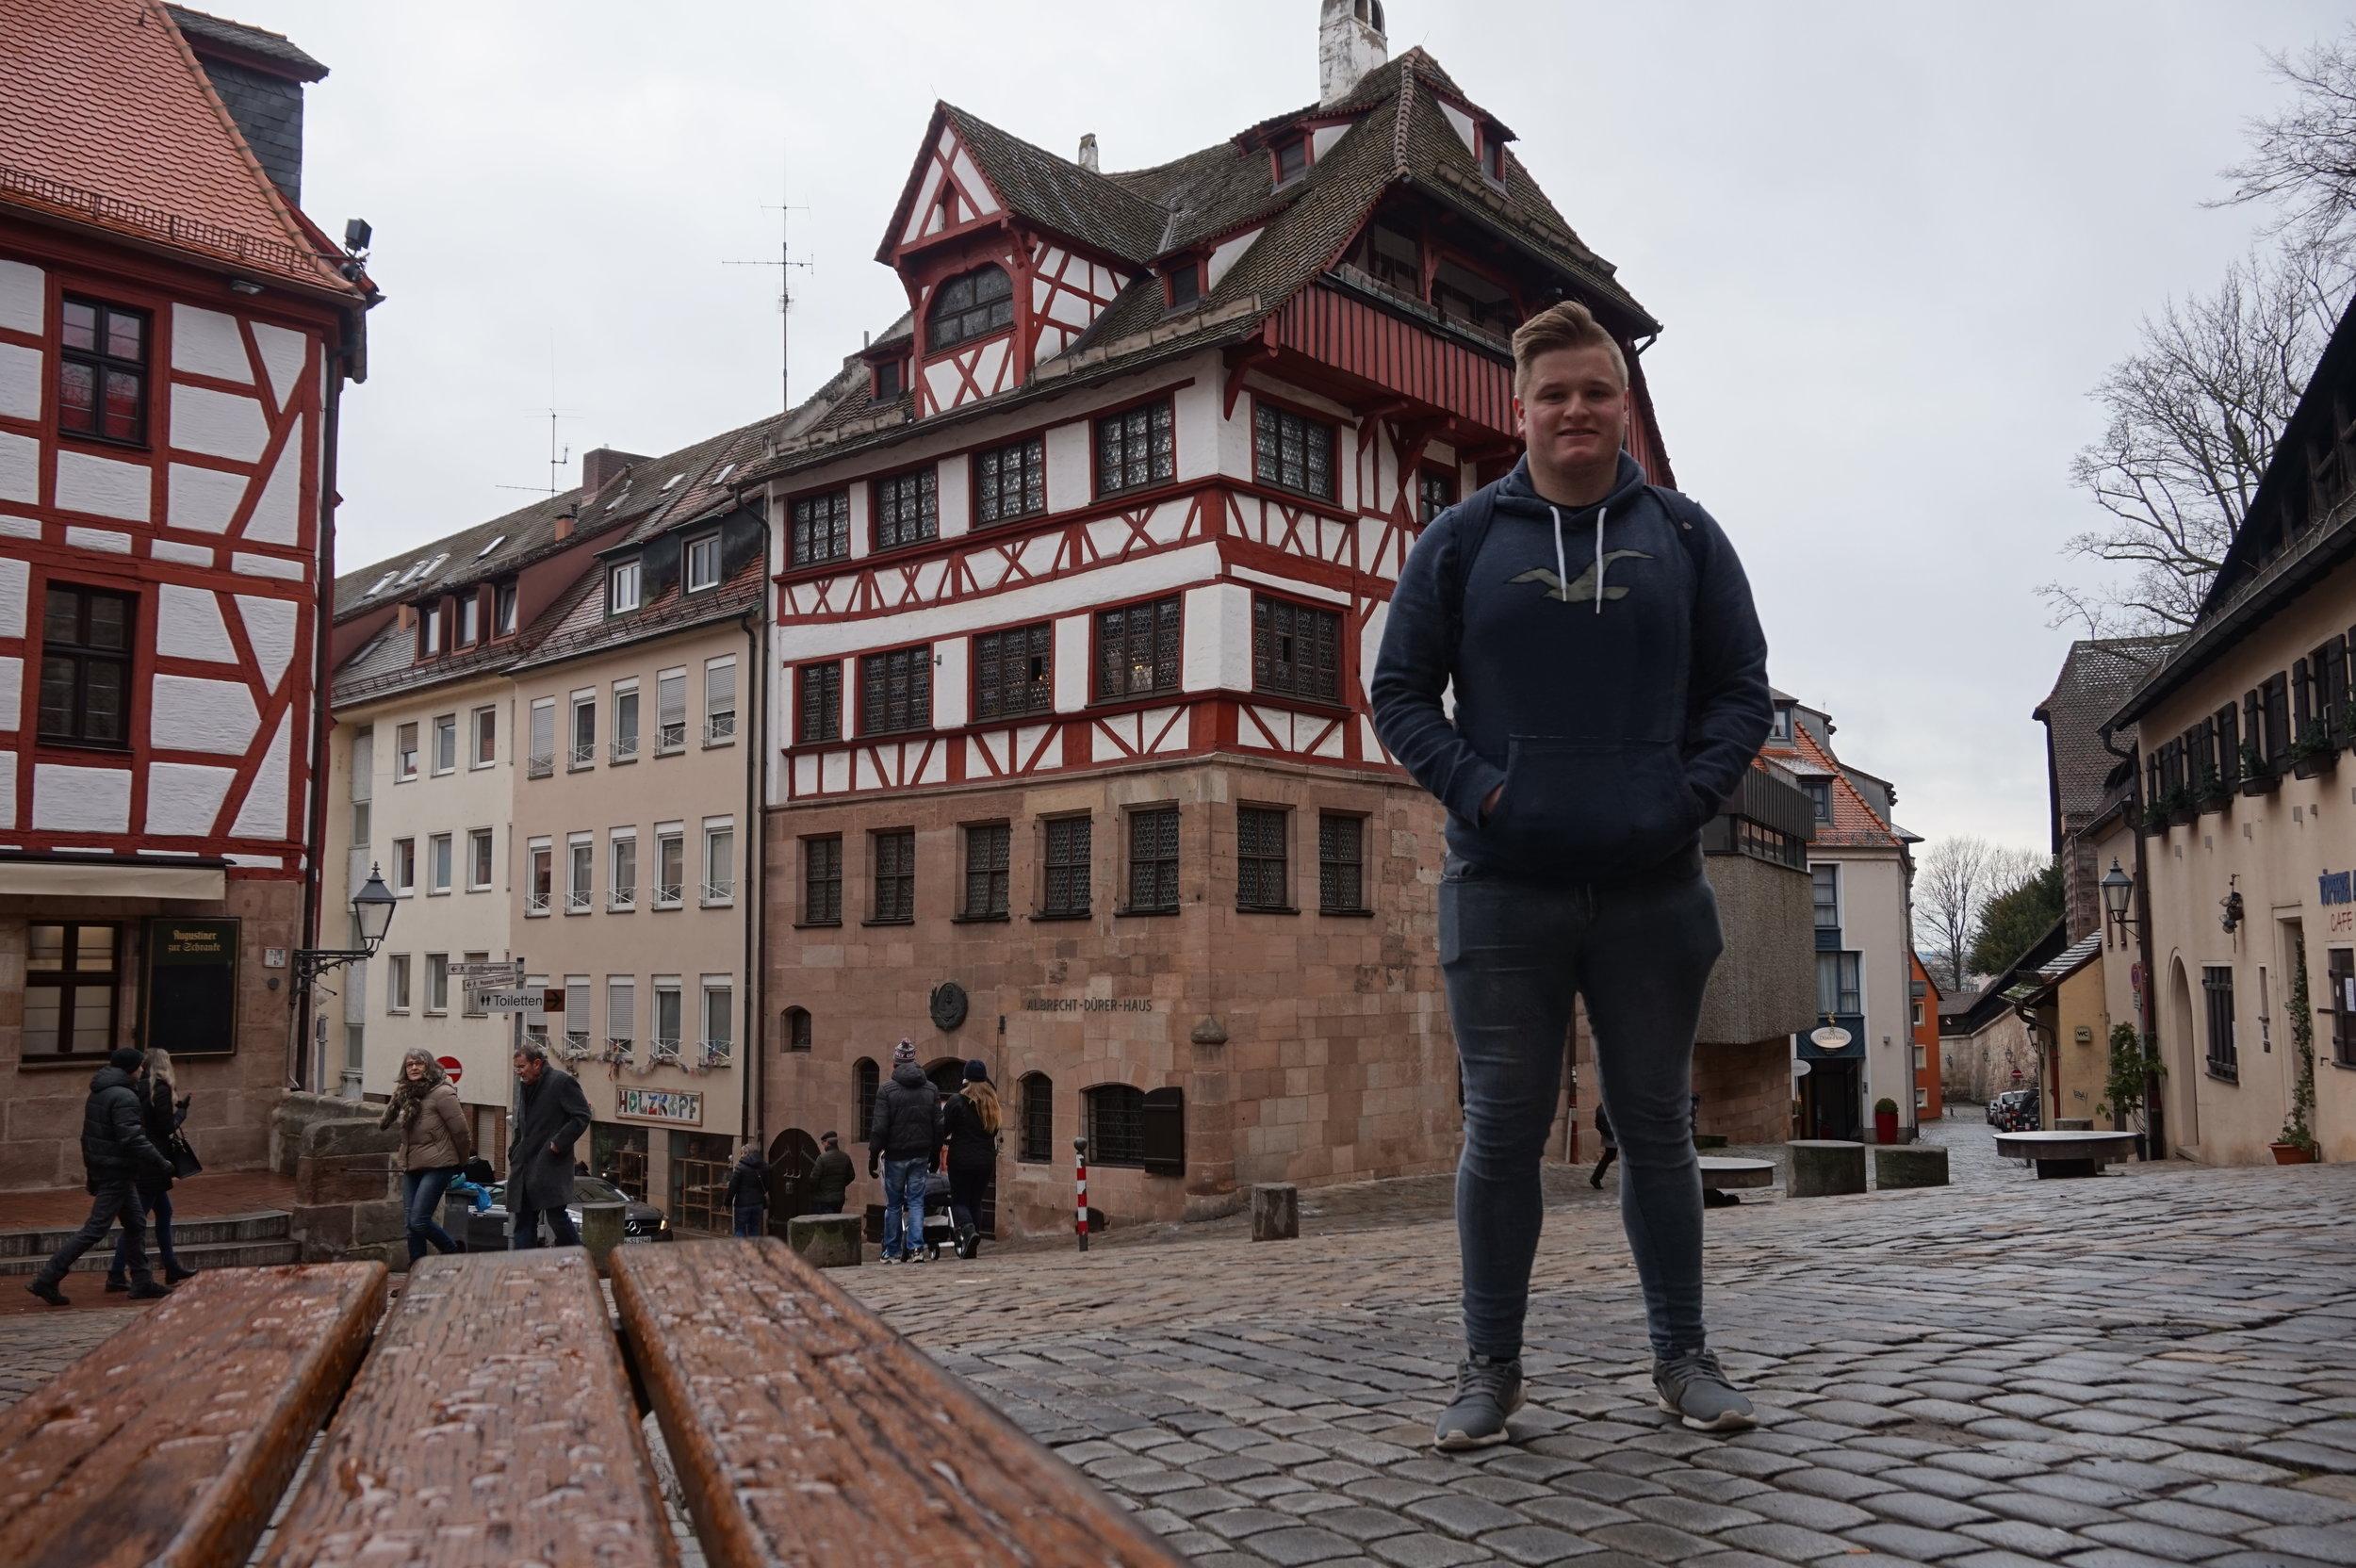 Travelling-Tom-Albrecht-Durer-House